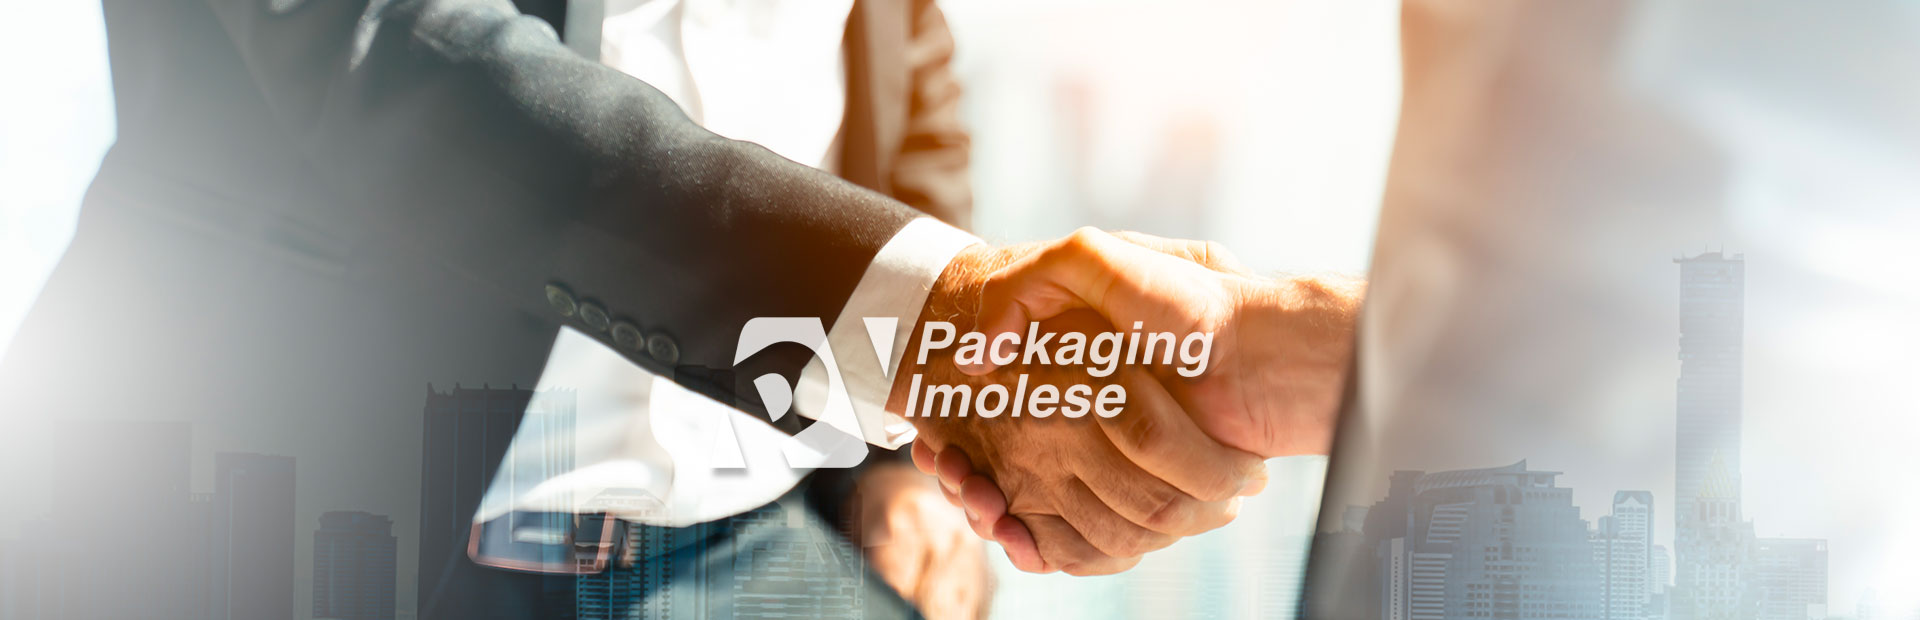 Packaging Imolese - rete vendita